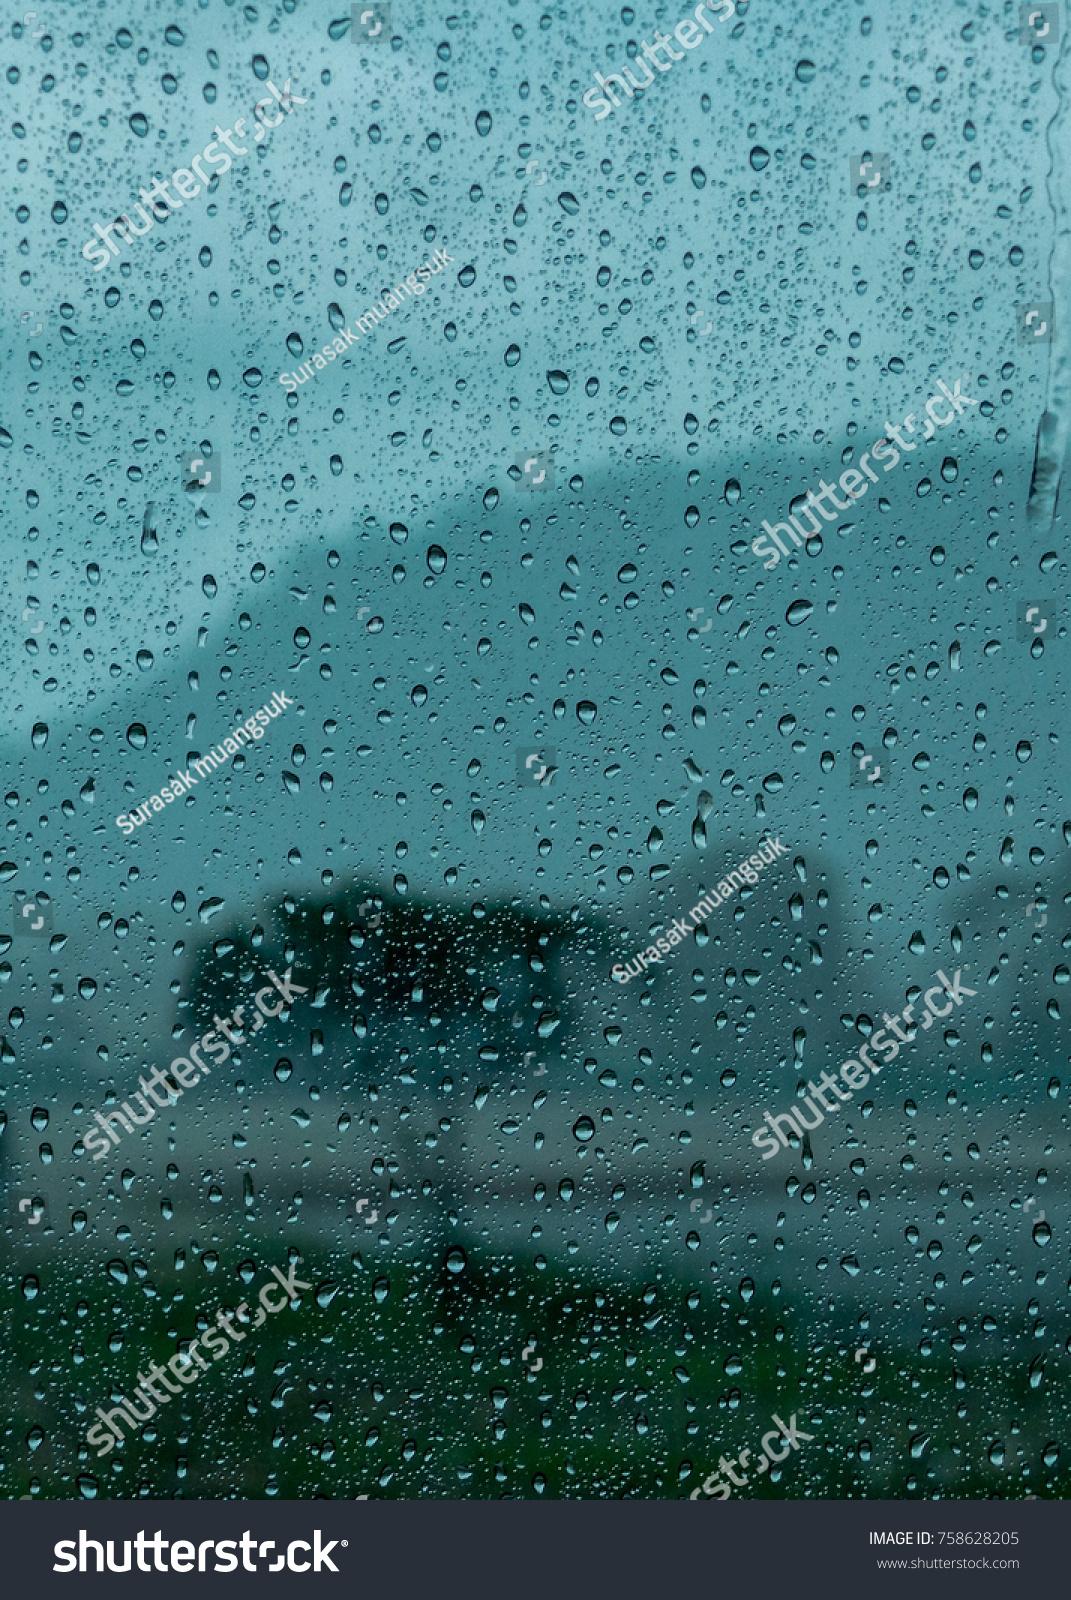 rain water drop of rain on glass window in the rainy season and